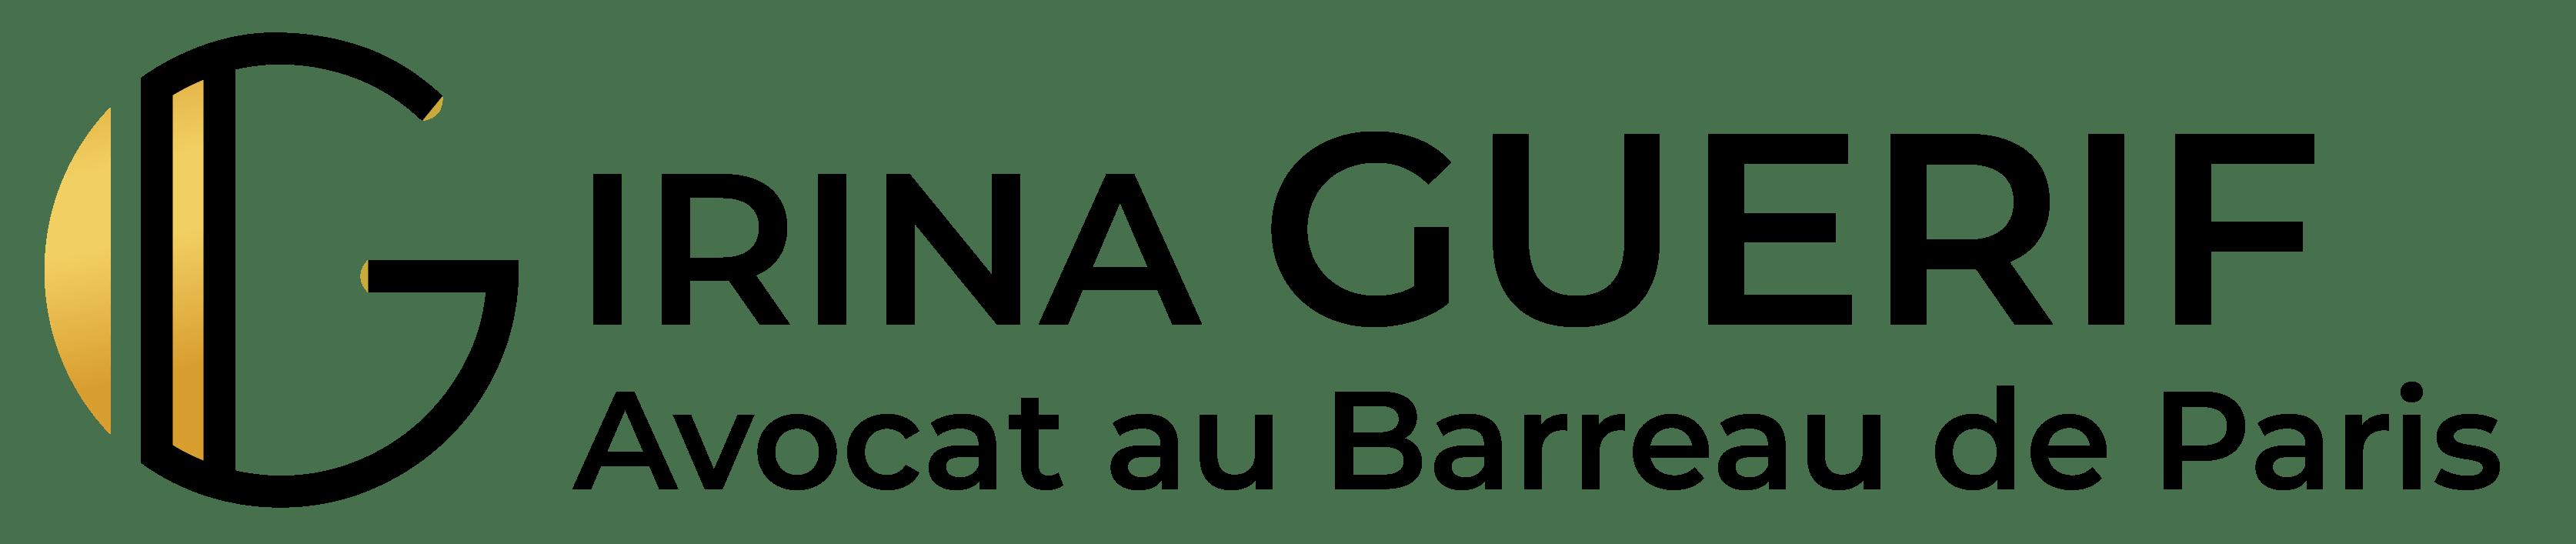 Irina Guerif – Avocat au Barreau de Paris